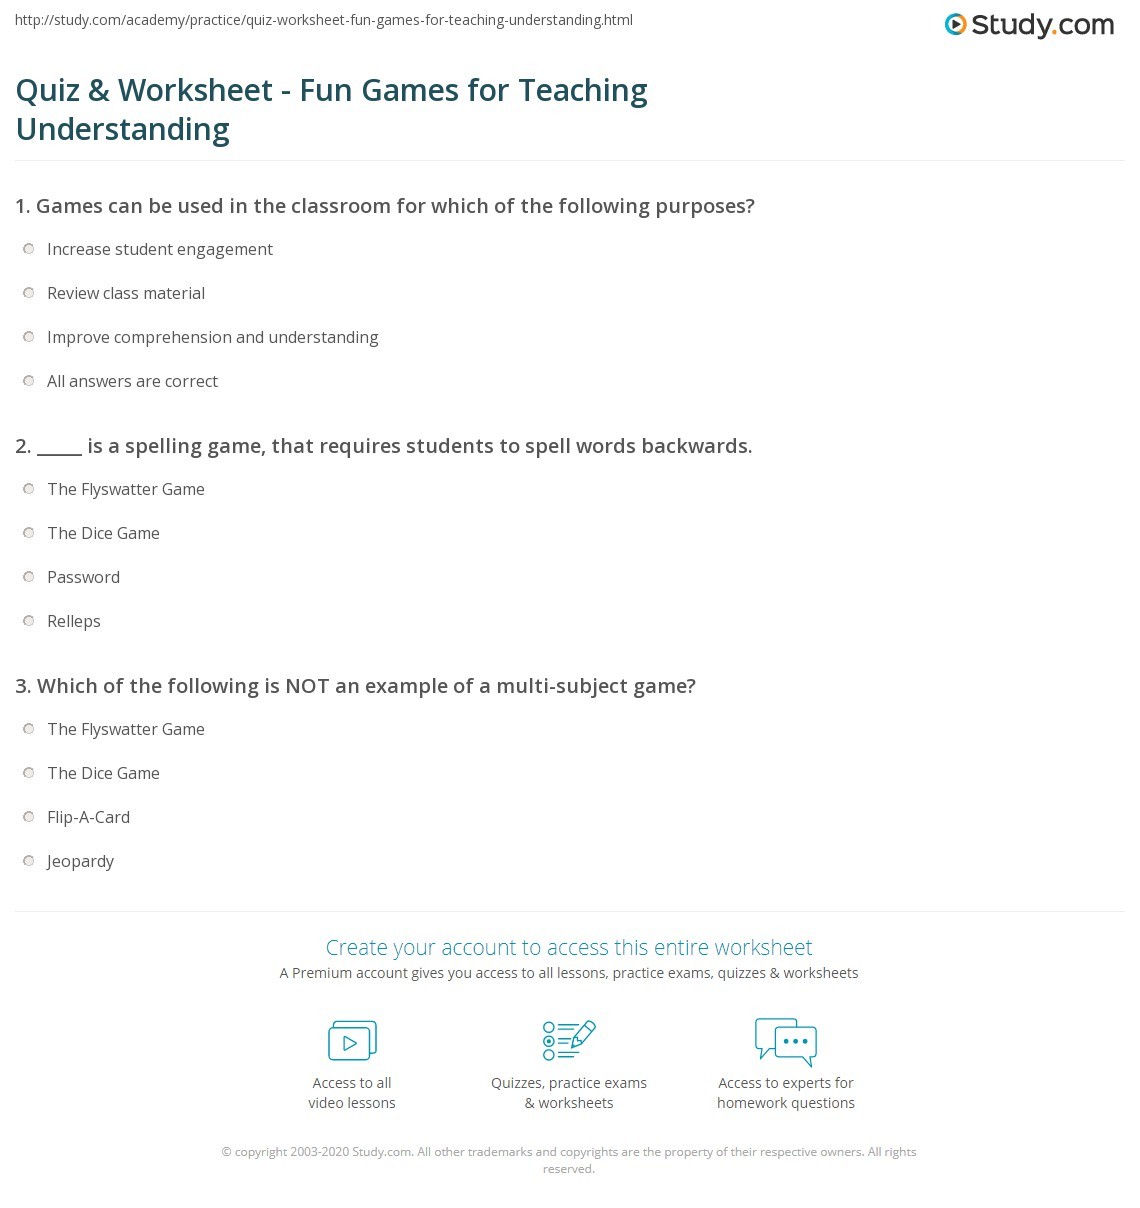 Quiz Worksheet Fun Games For Teaching Understanding Study